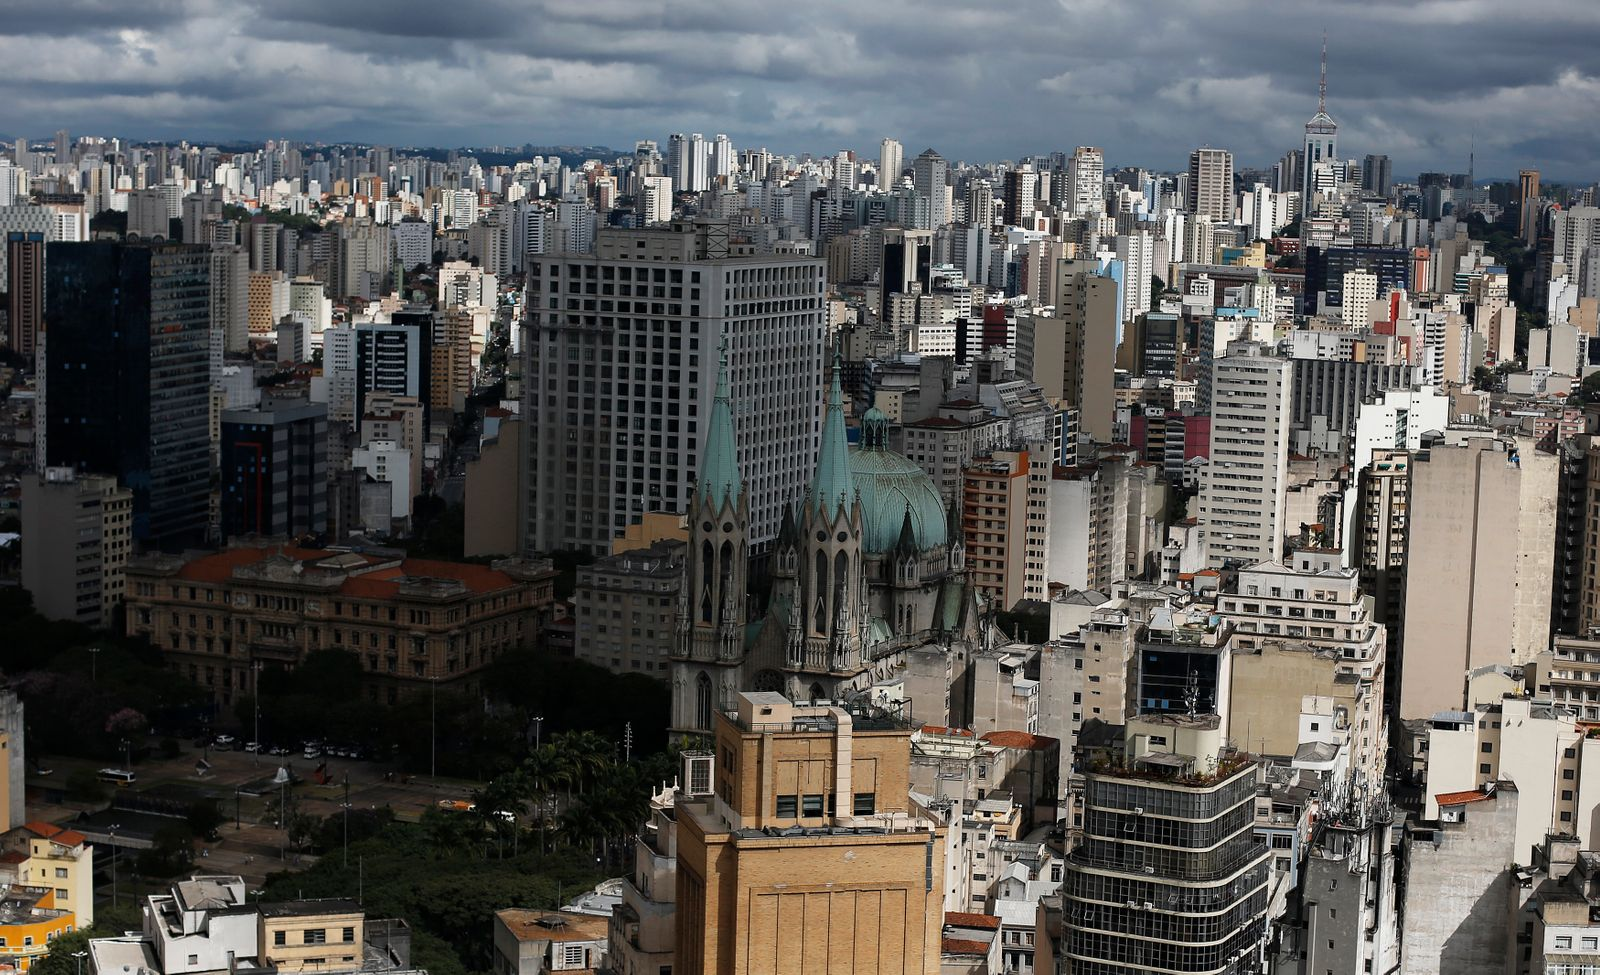 TRAVEL-SAOPAULO/